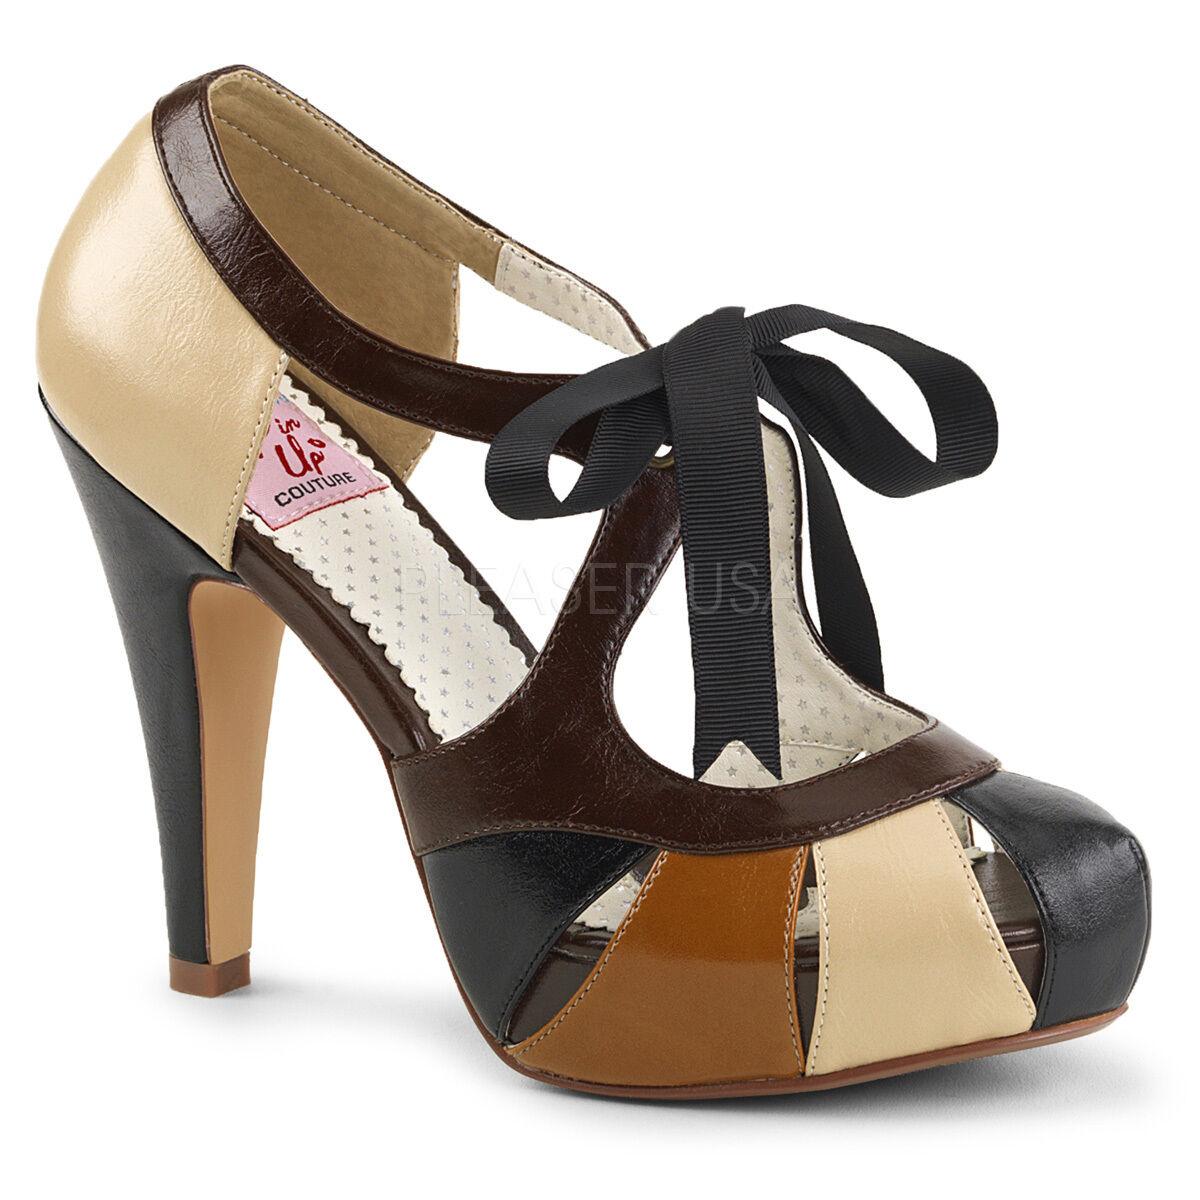 PINUP BETT19/TMCPU Retro Platform Closed ToeTie Front Cutout Sandales Damens Schuhes